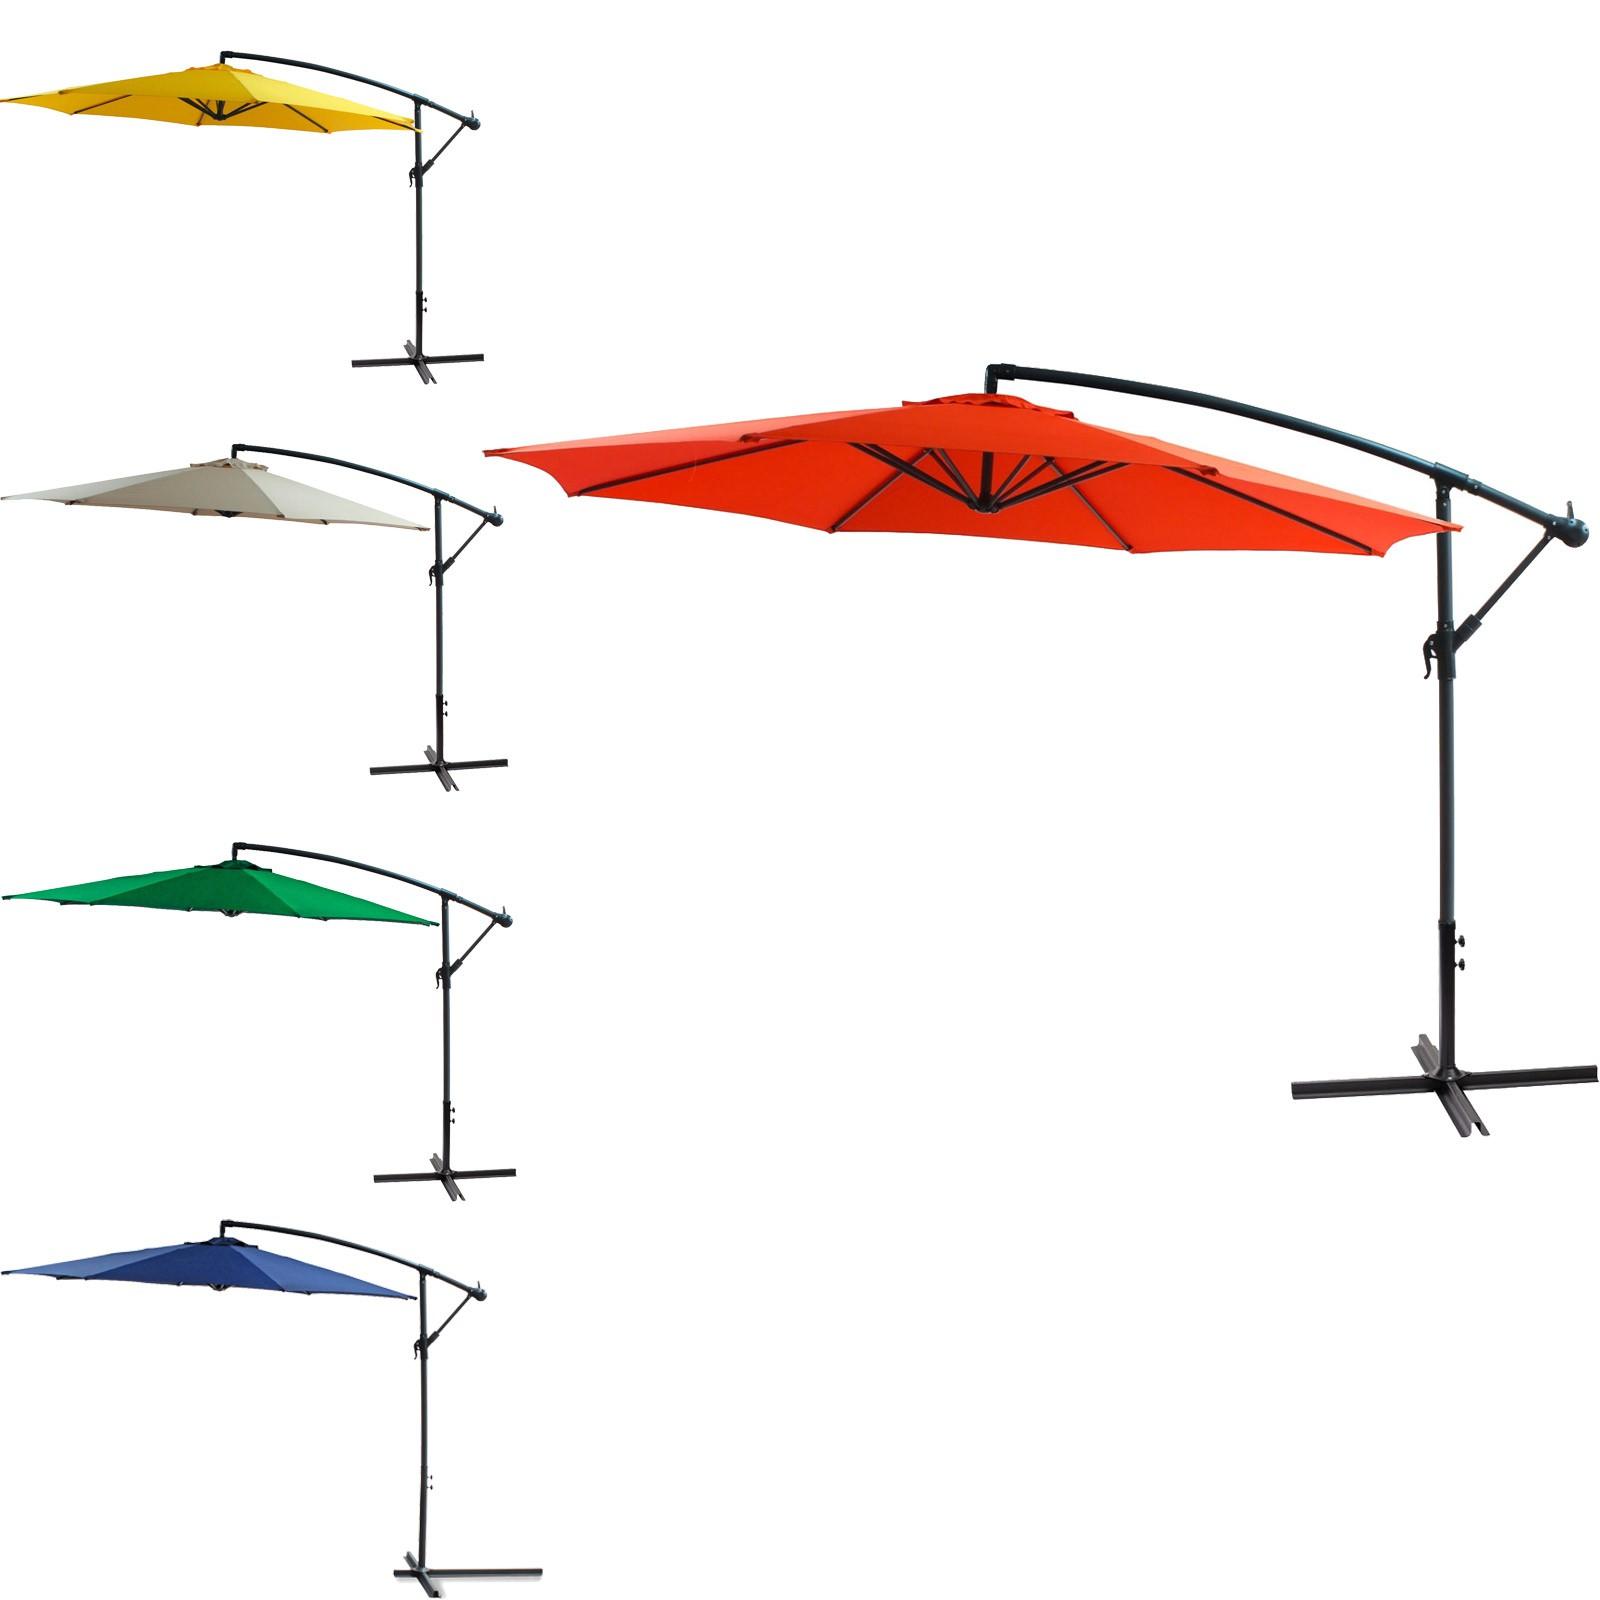 ampelschirm sonnenschirm gartenschirm schirm 3 meter verschiedene farben ebay. Black Bedroom Furniture Sets. Home Design Ideas